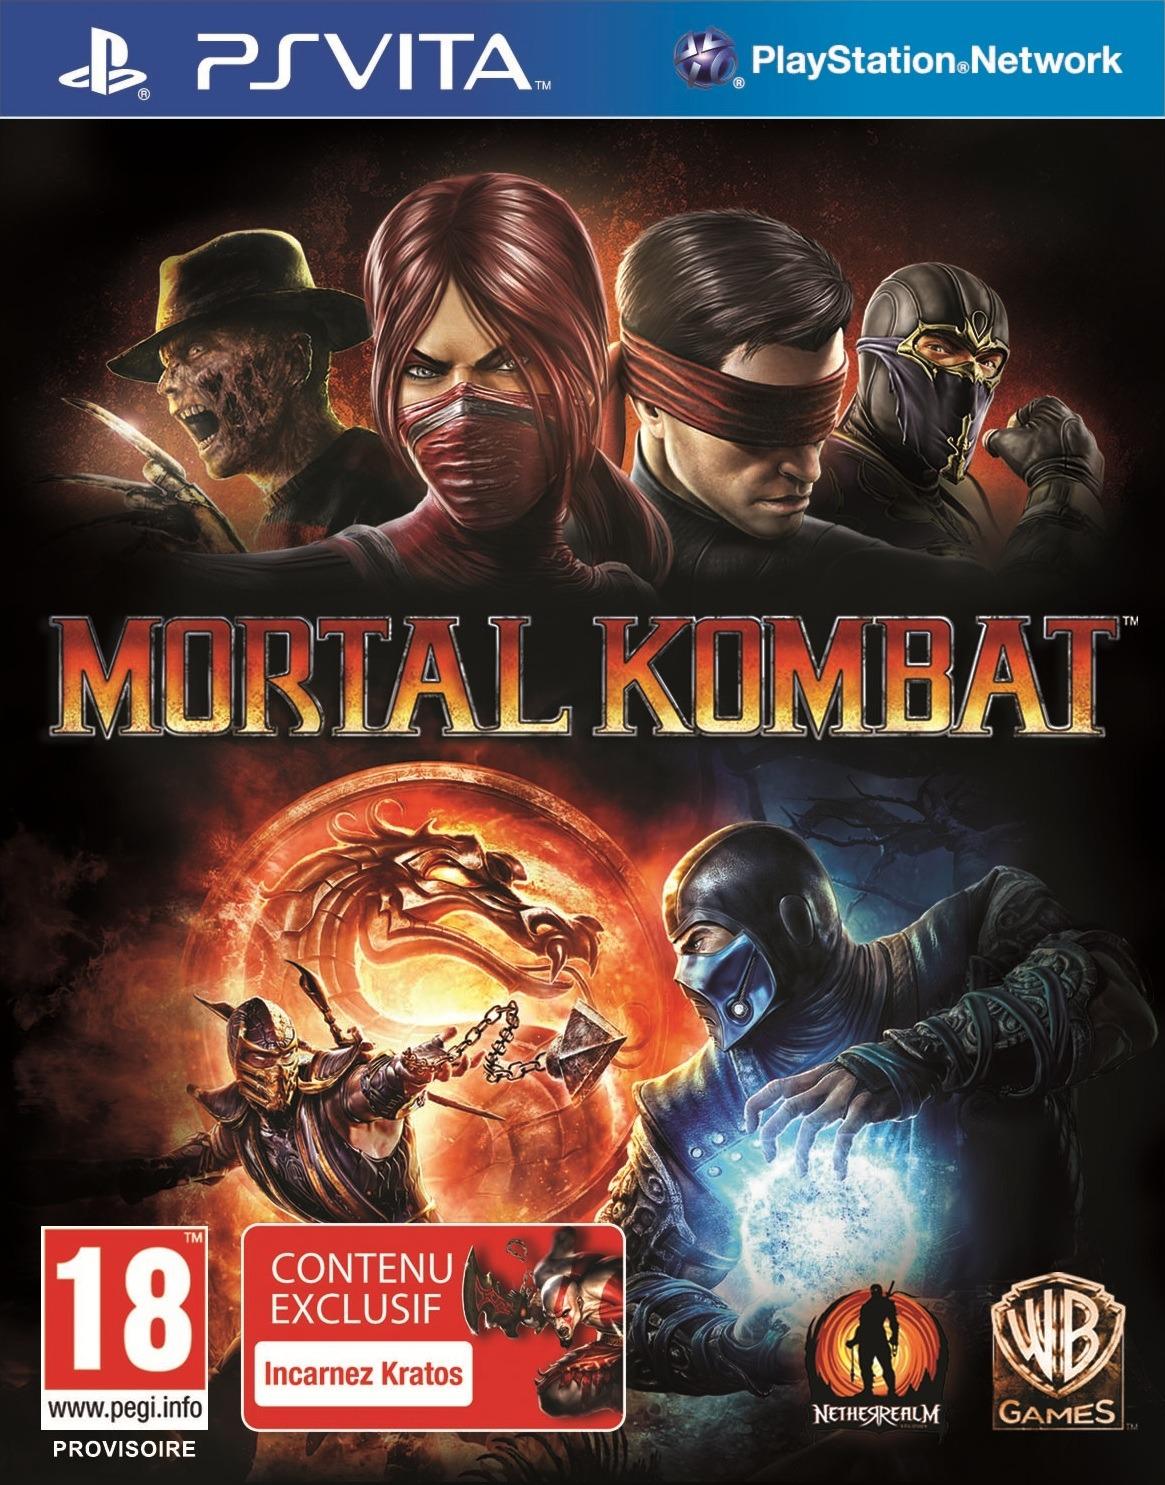 jaquette-mortal-kombat-playstation-vita-cover-avant-g-1326811967.jpg